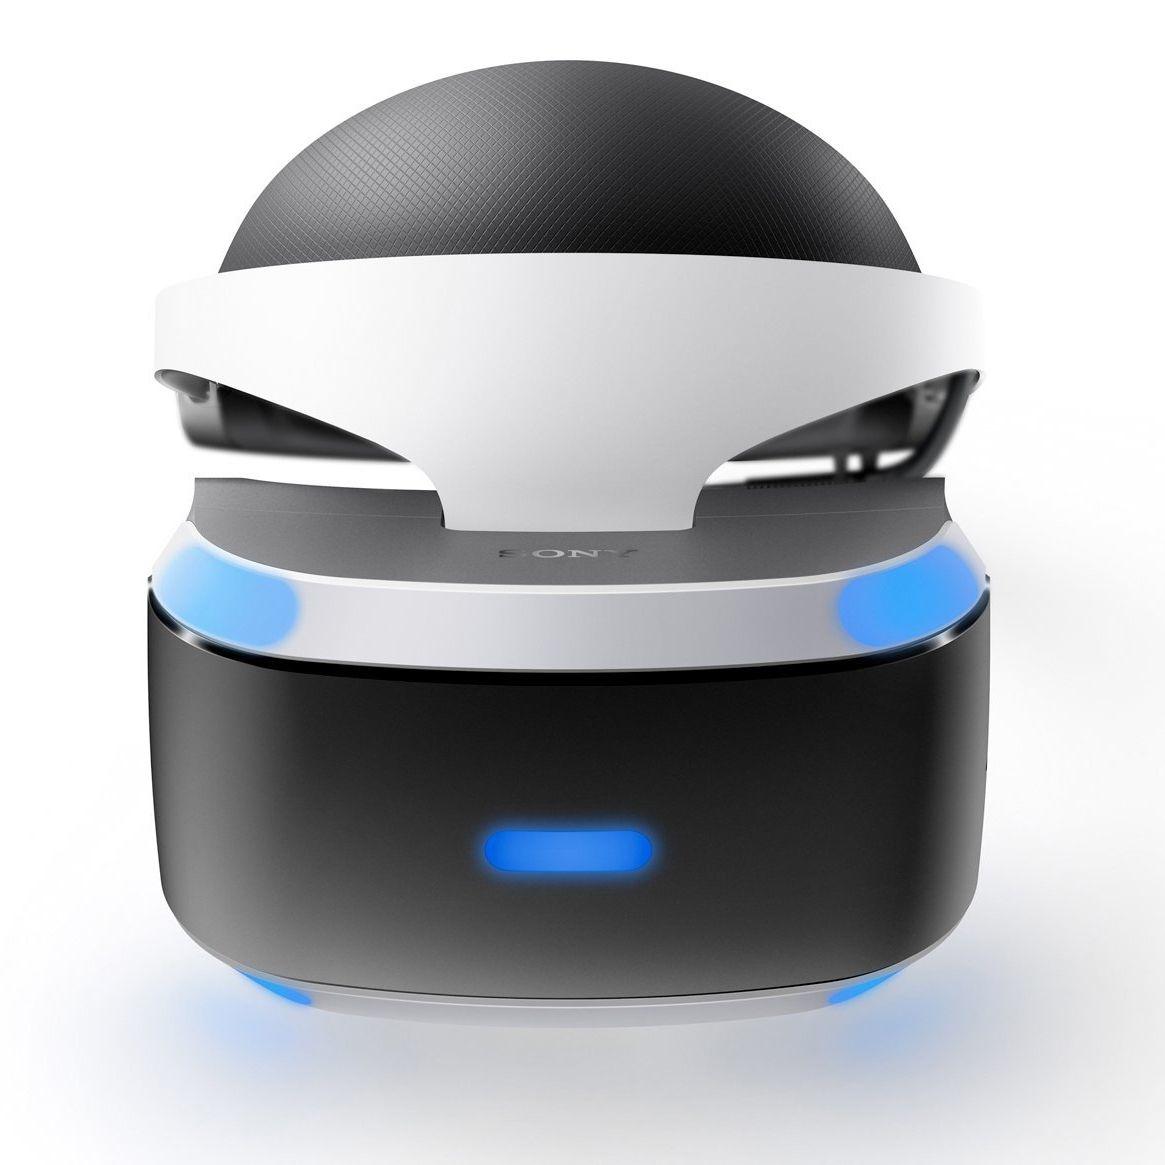 Playstation ( PS4 ) VR ( Virtuális valóság ) v2 dobozos újszerű